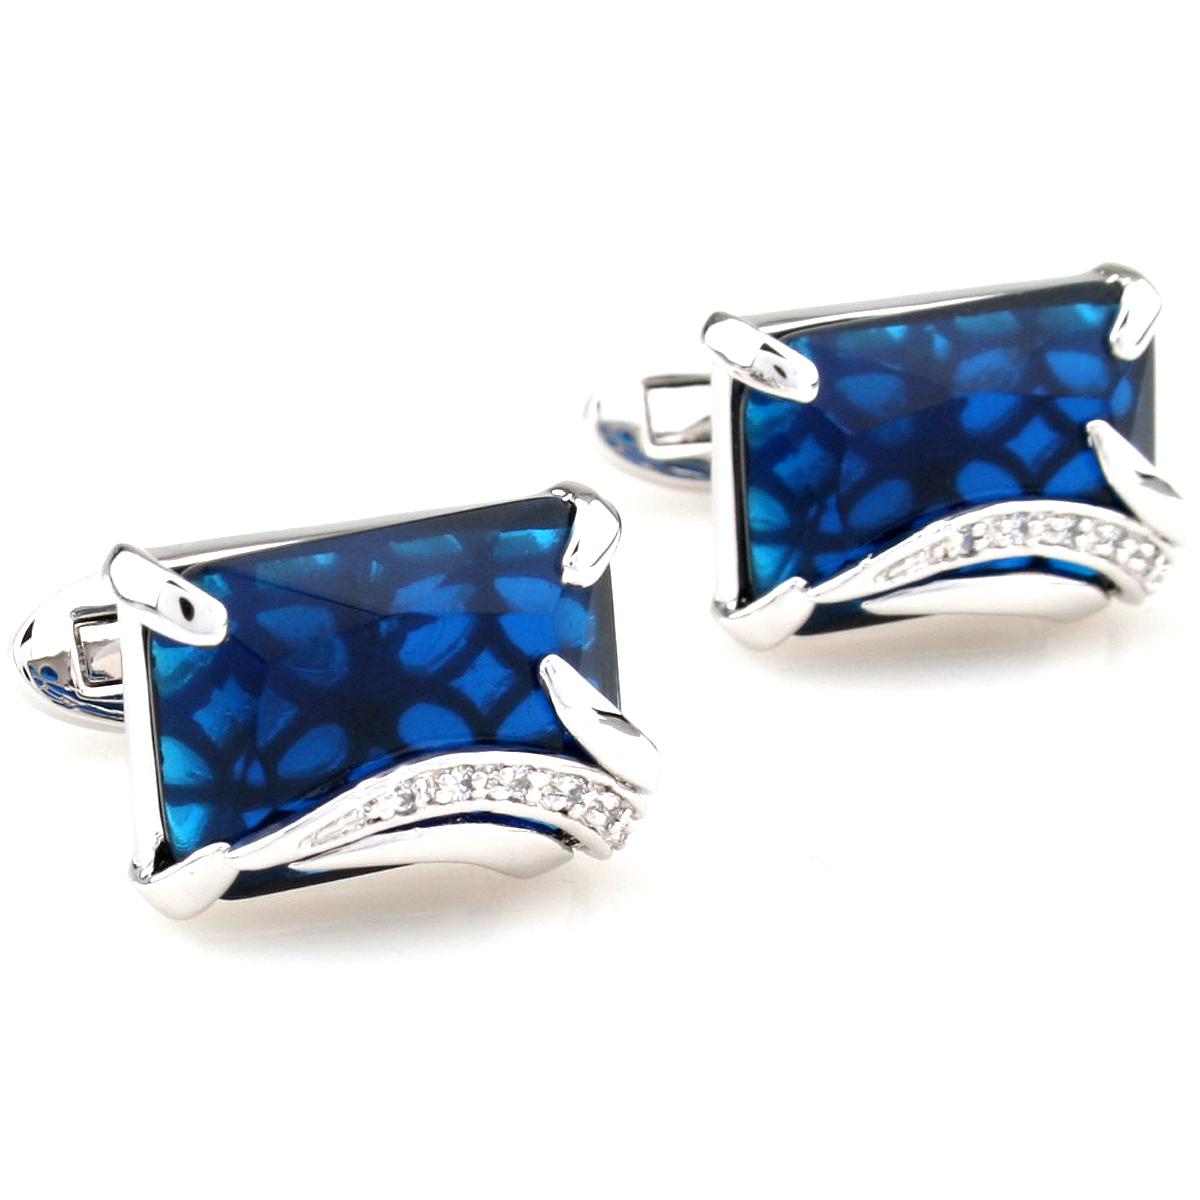 3 x Cuff Links Rare Wedding Groom Zircon male silver blue series gold brown cufflinks 3 Pairs Wholesale 2500016(China (Mainland))